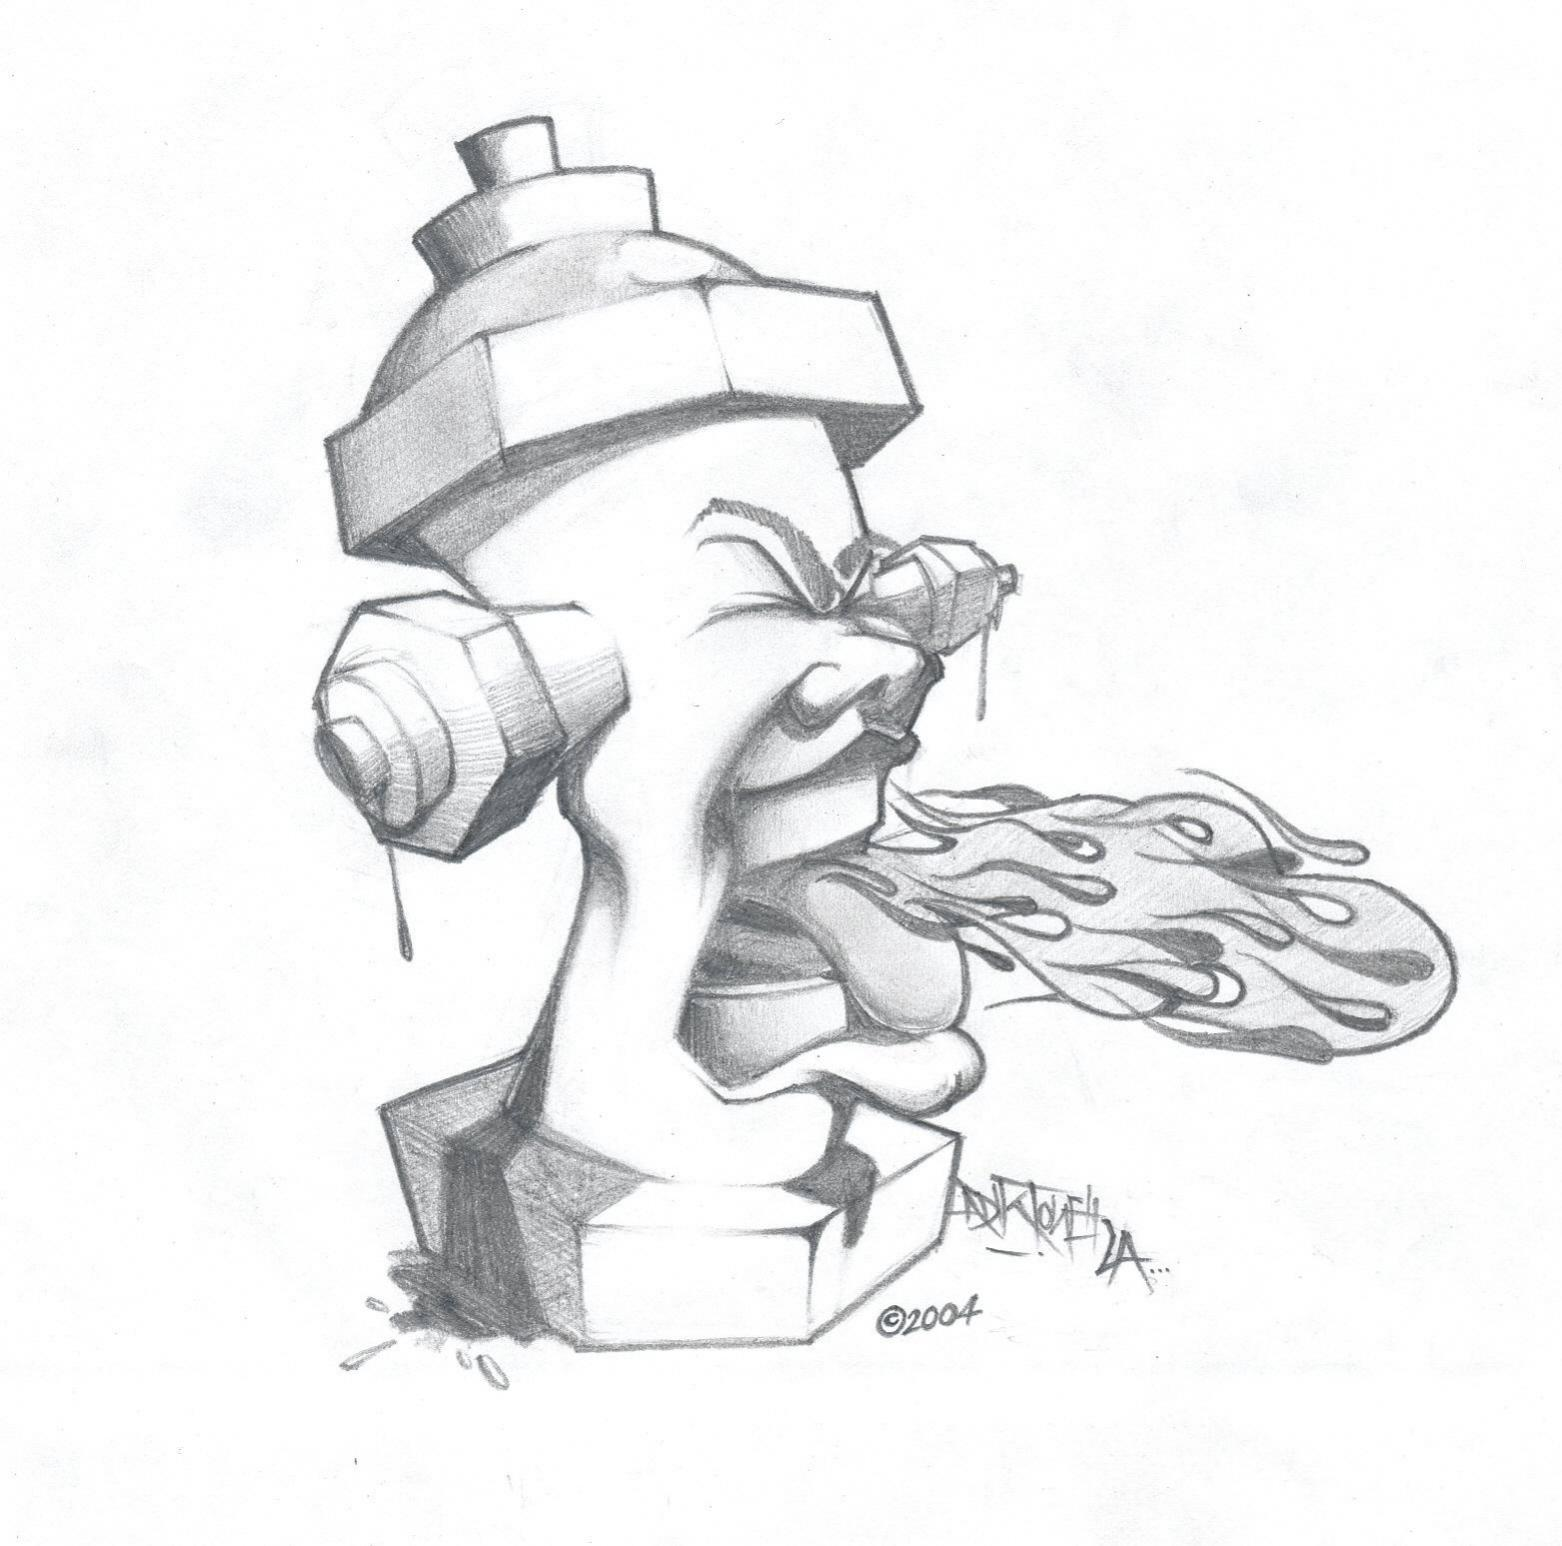 fire_hydrant_drawing.jpg